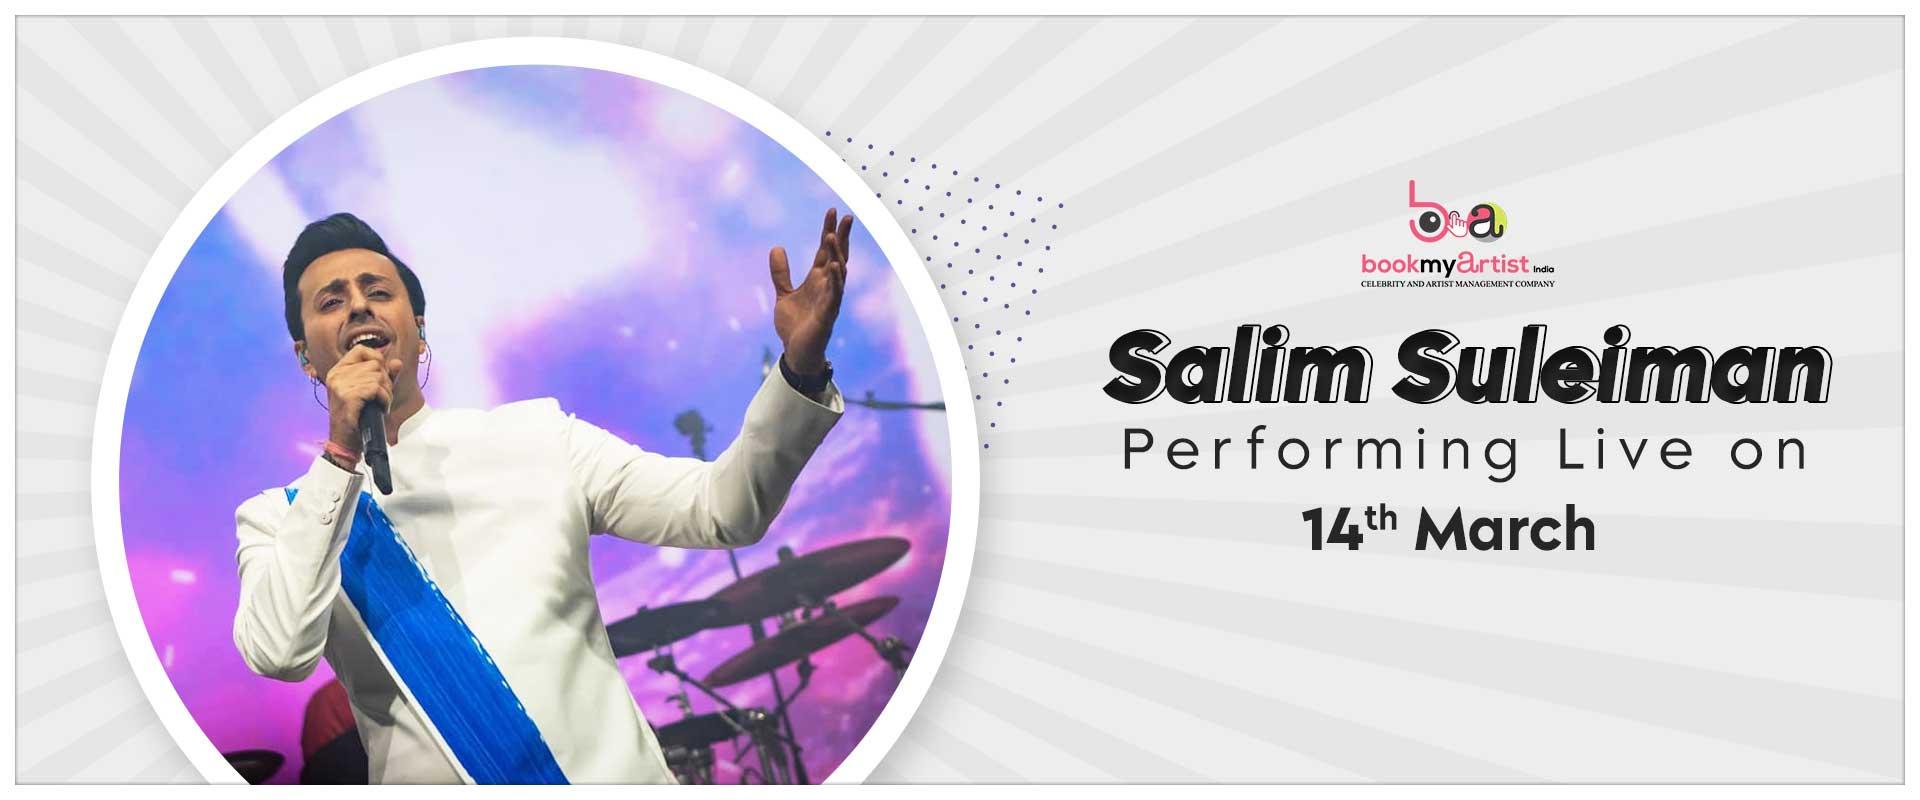 Saleem Suleman